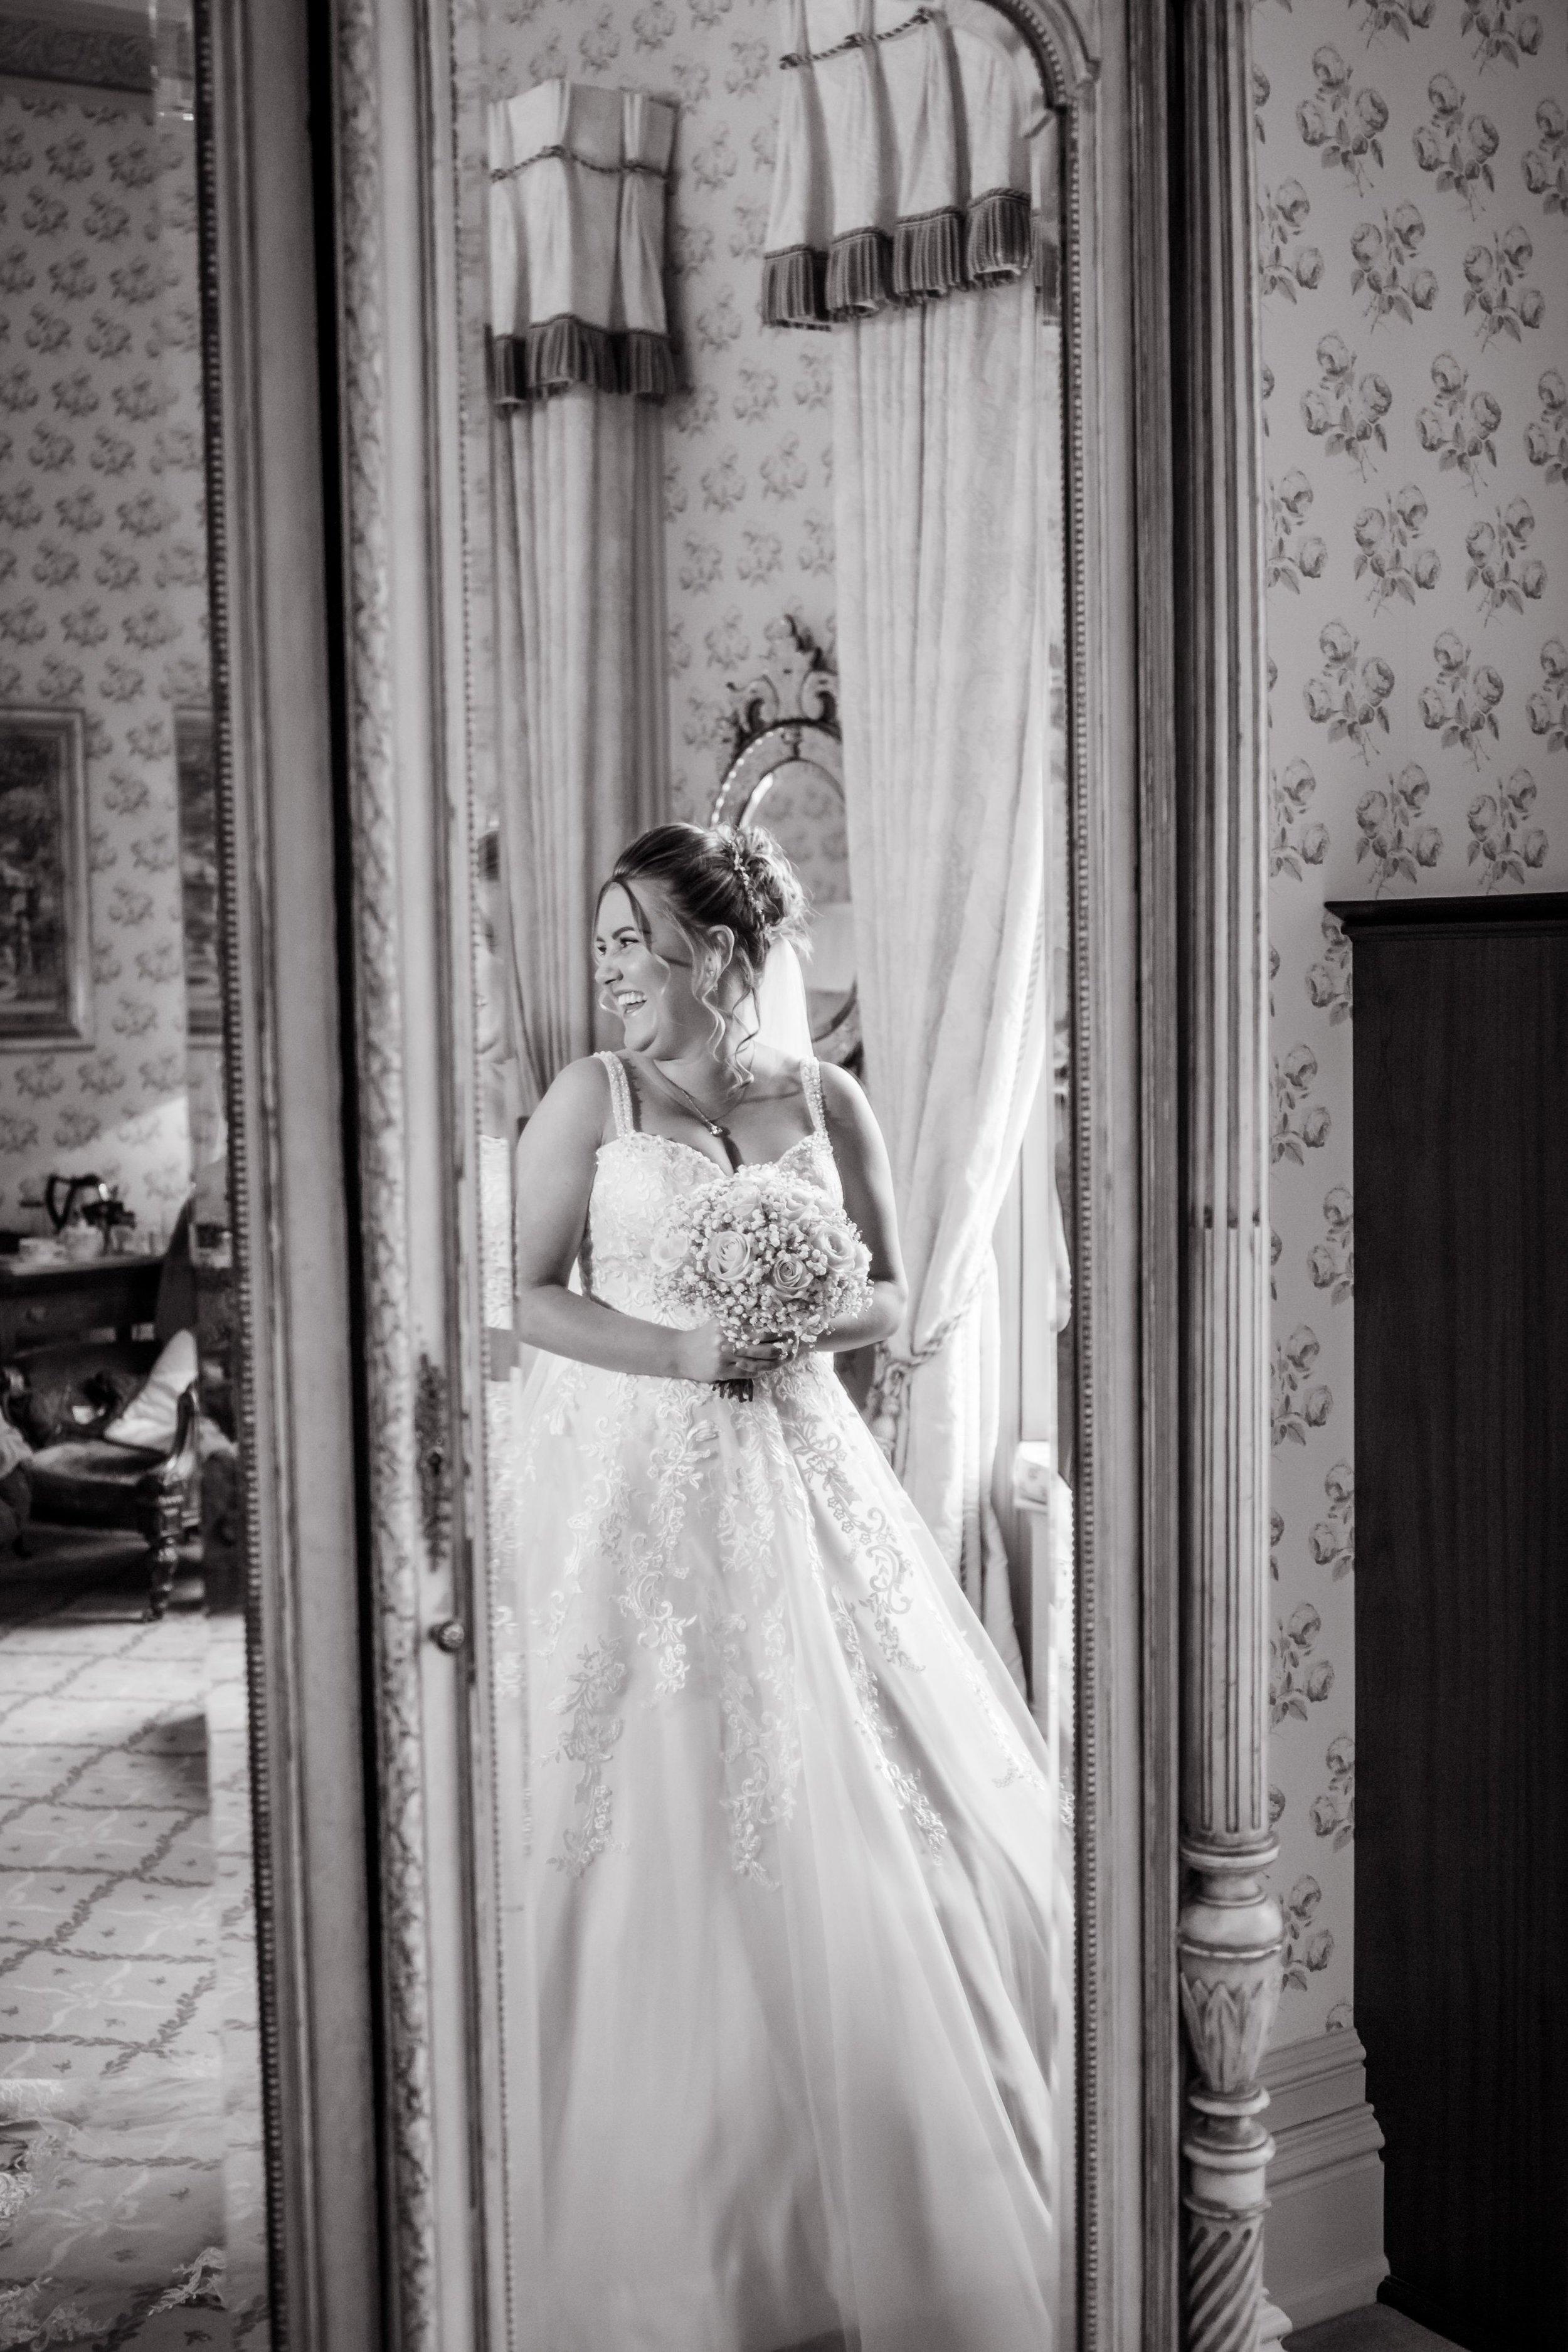 Bride's reflection